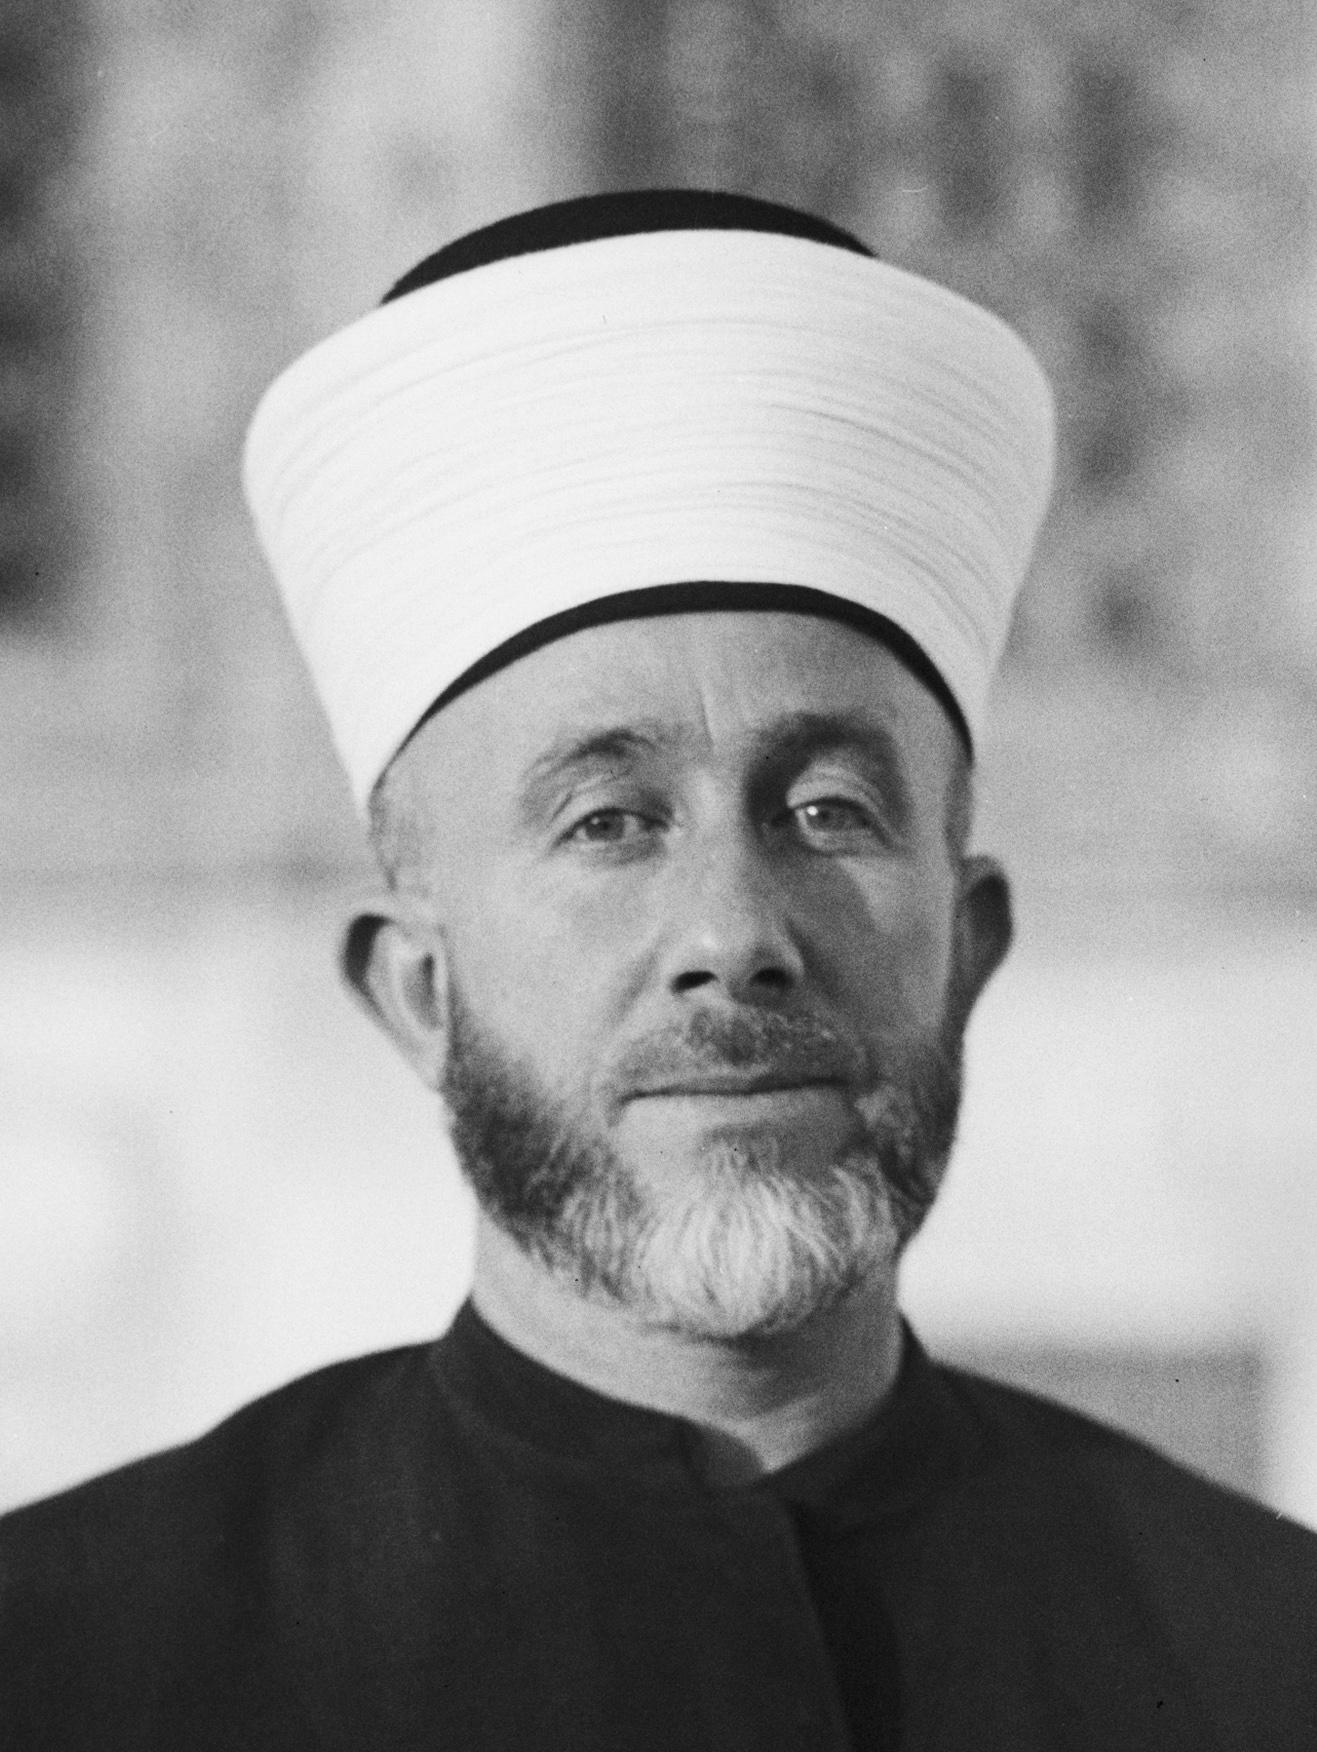 Haj Mohammed Effendi Amin el-Husseini (1895-1974)